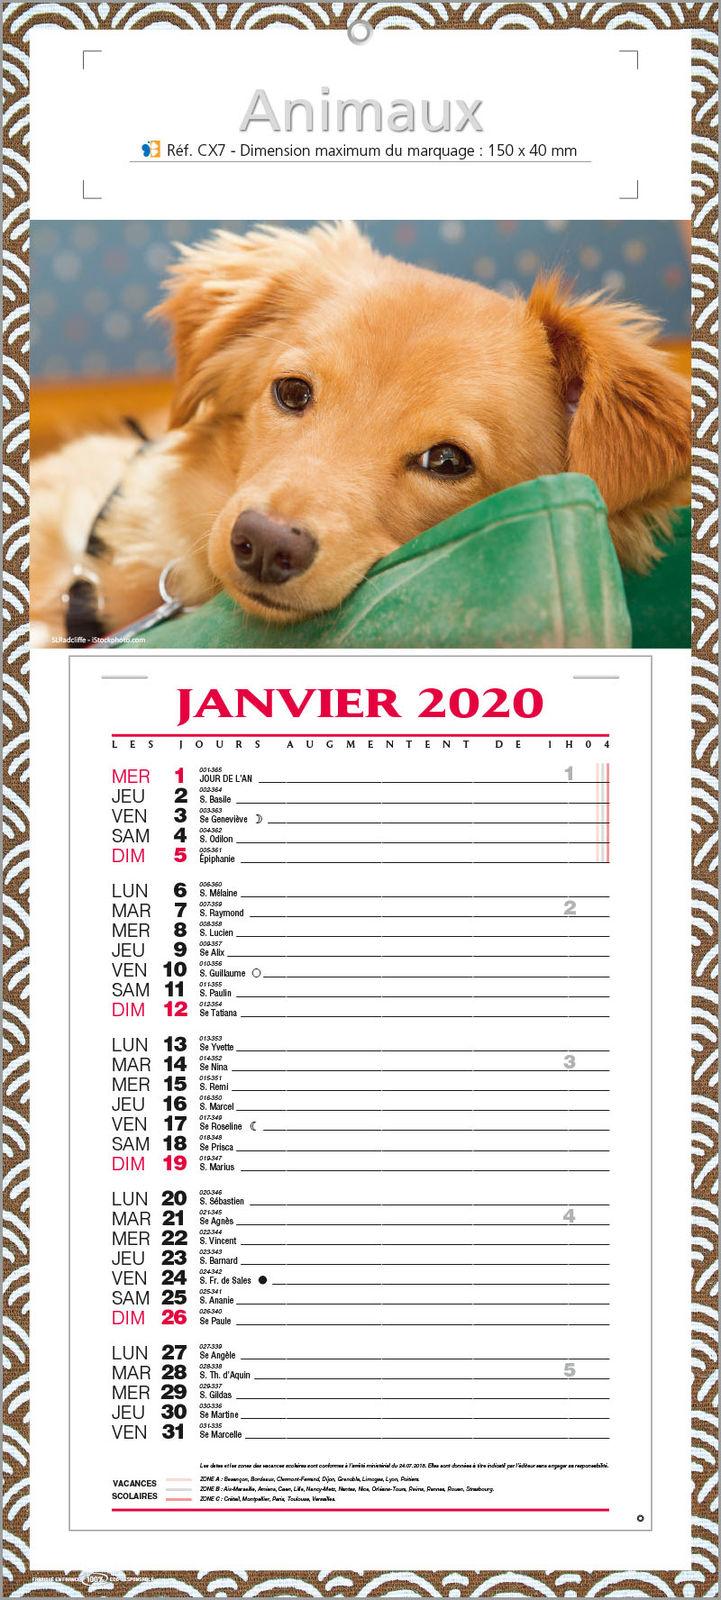 Calendrier 2020 Animaux.Calendrier Publicitaire Bloc Animaux